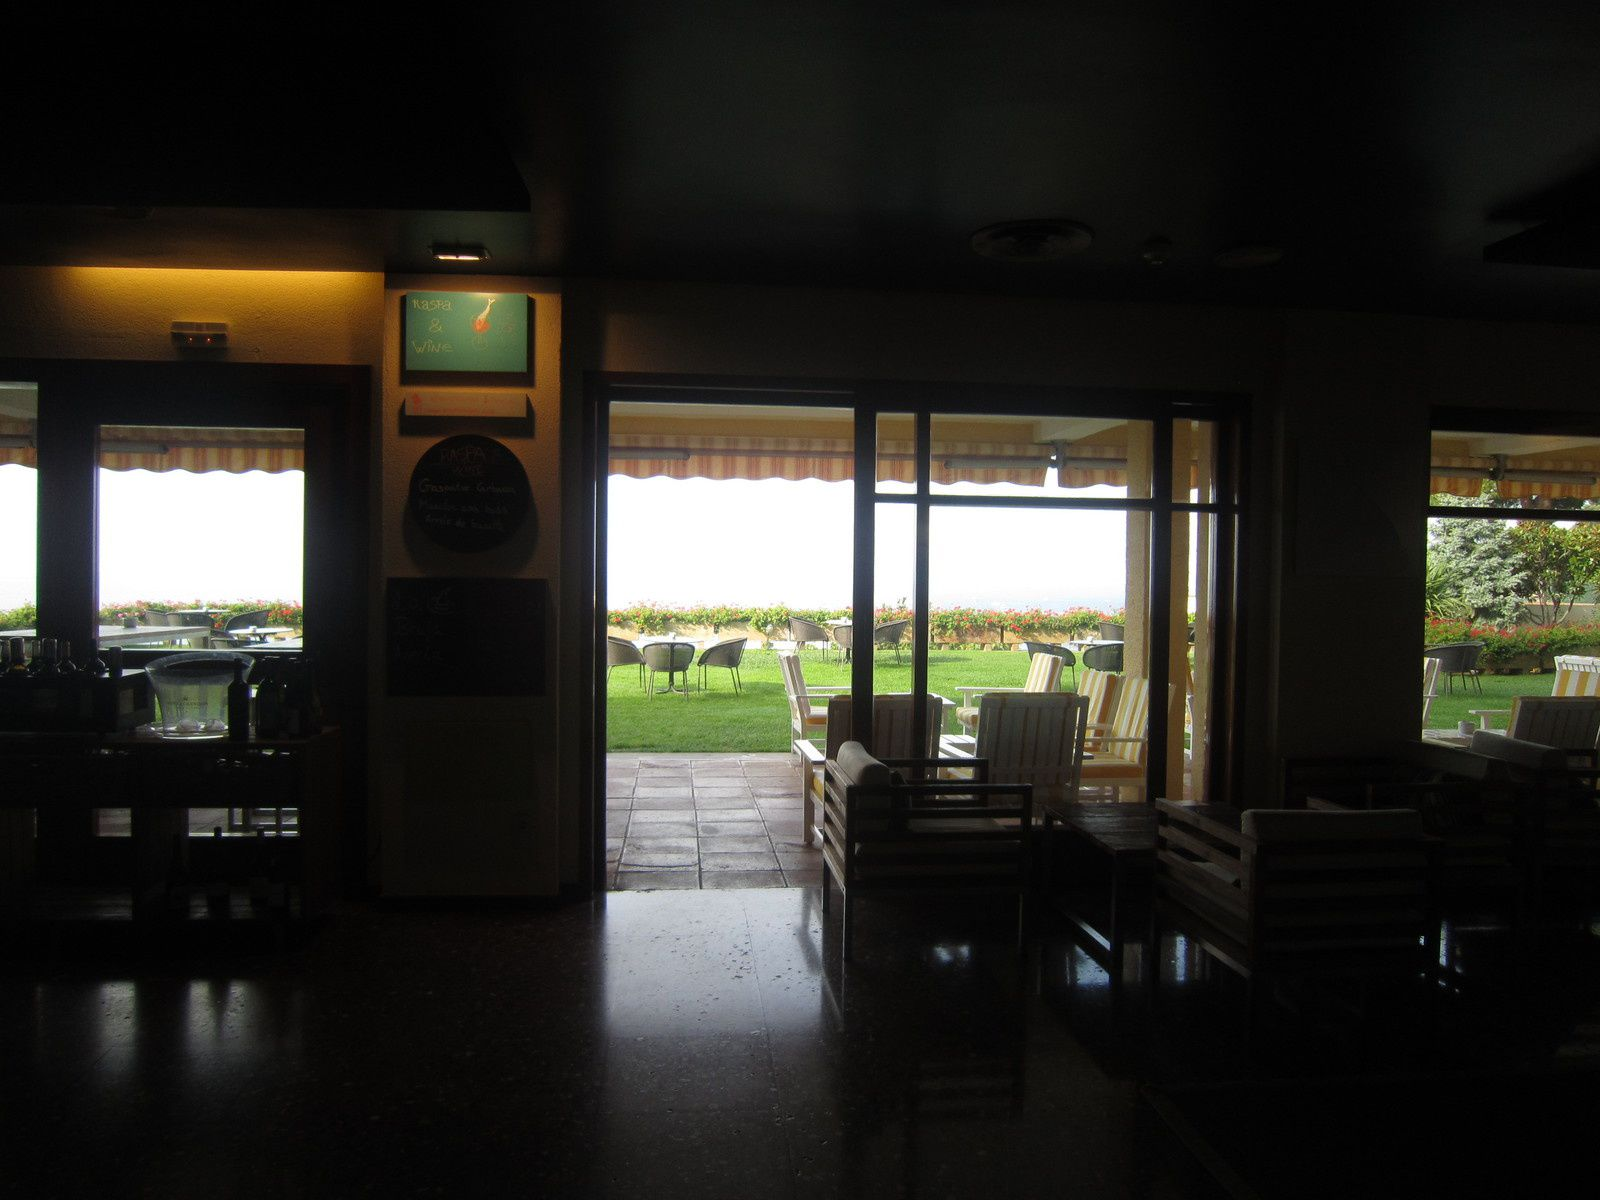 Almadraba Hotel à Almadraba